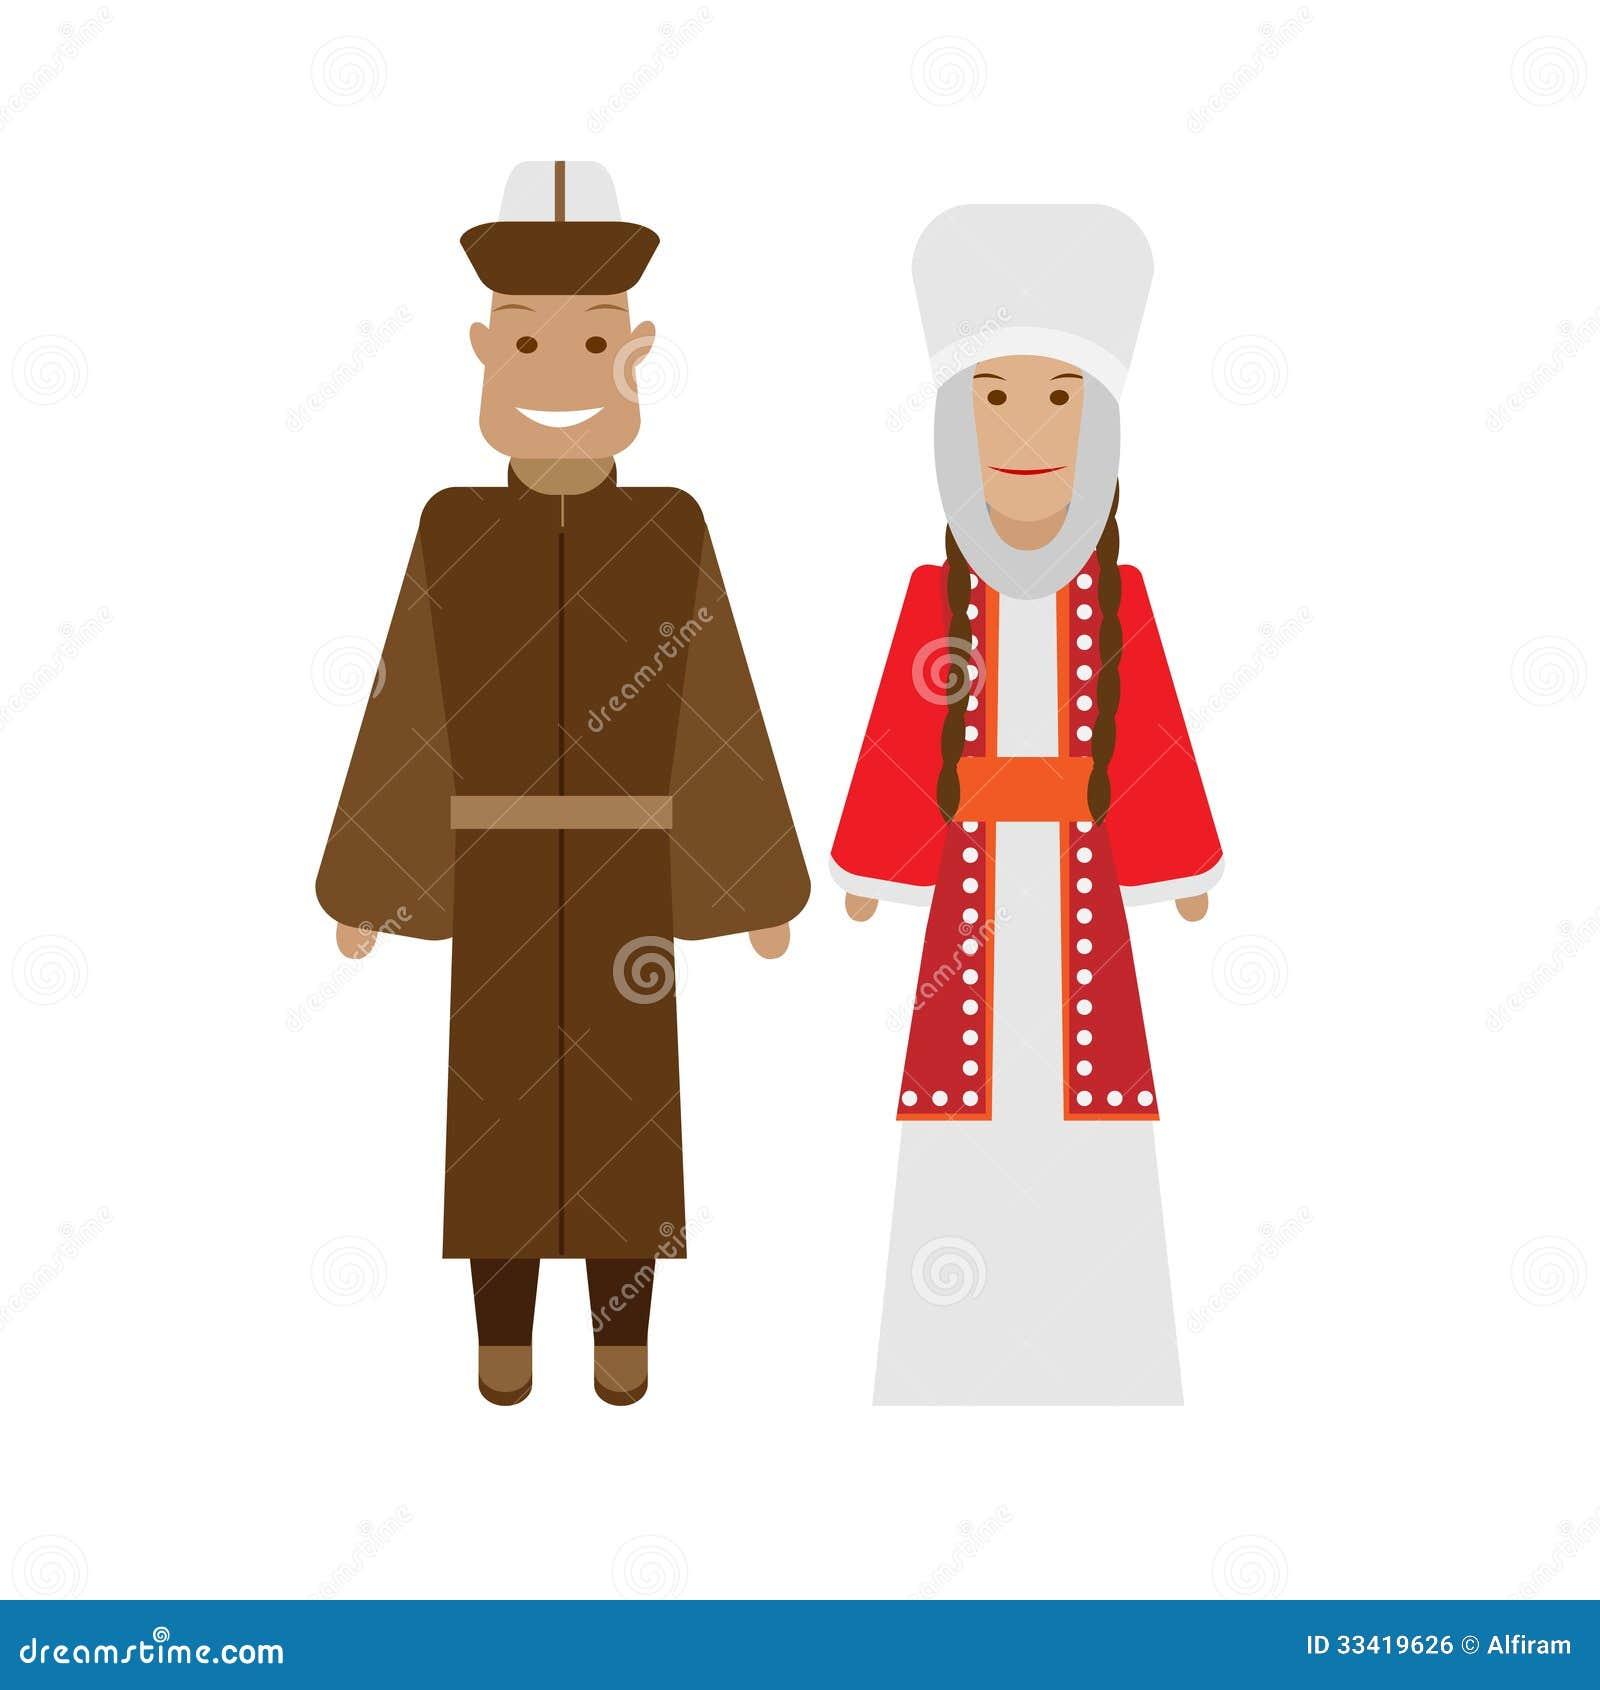 Kyrgyz National Dress Royalty Free Stock Image - Image: 33419626